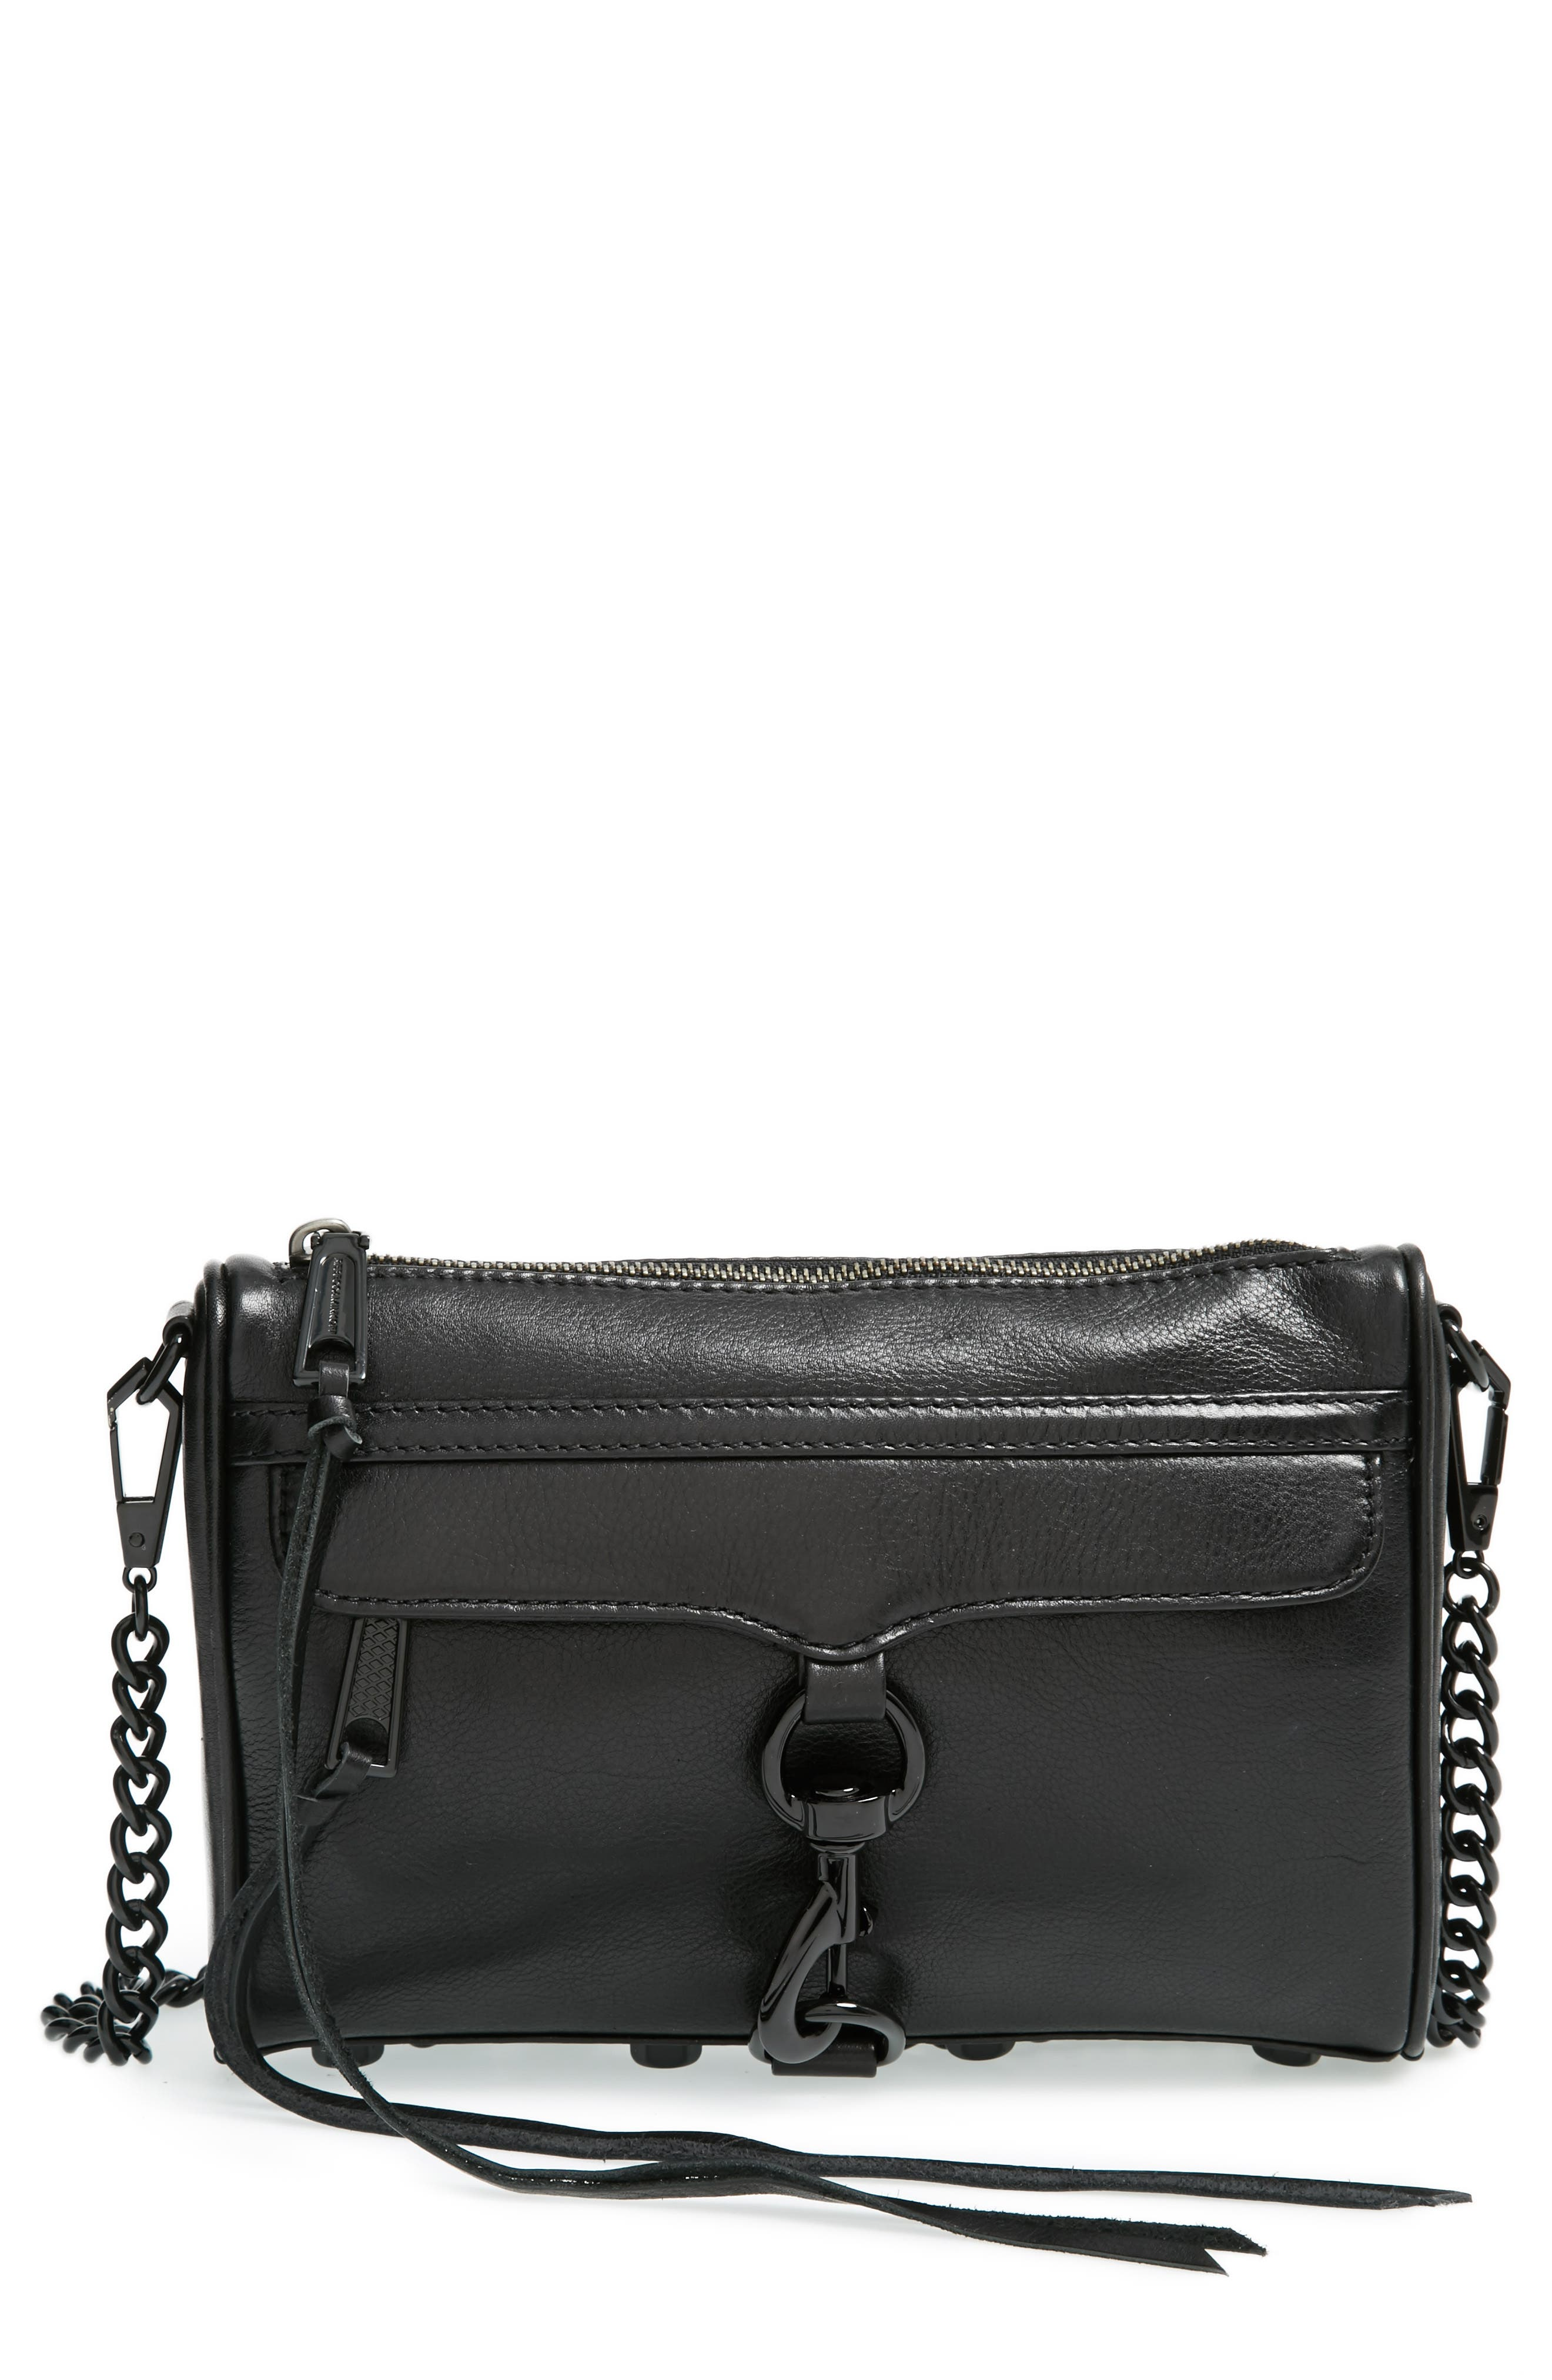 Mini MAC Convertible Crossbody Bag,                             Main thumbnail 1, color,                             BLACK/ BLACK HRDWR